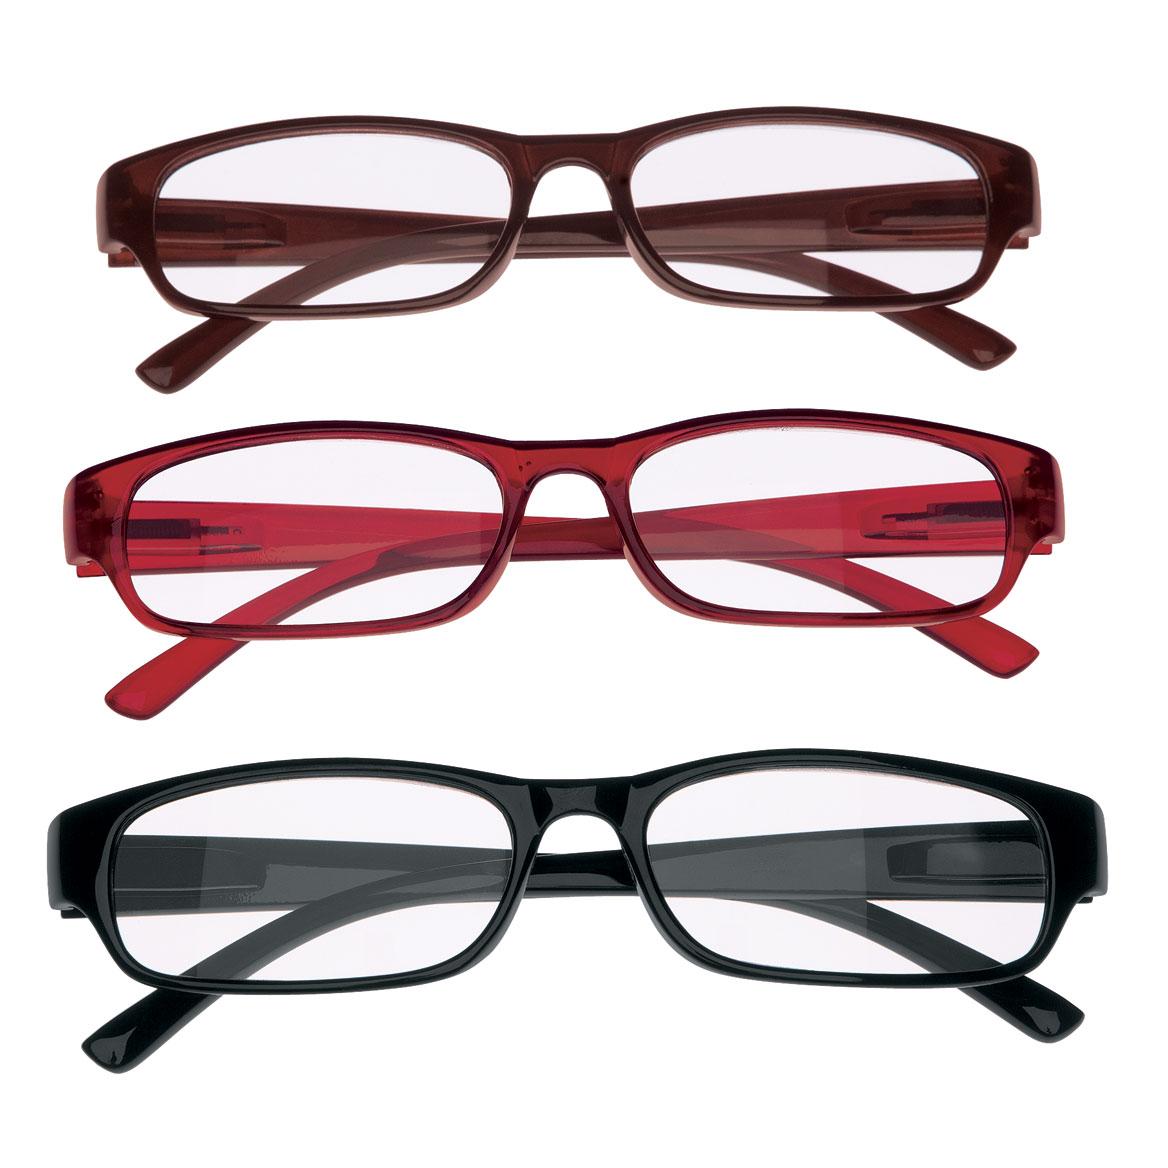 Bifocal Reading Glasses, Set of 3-358872